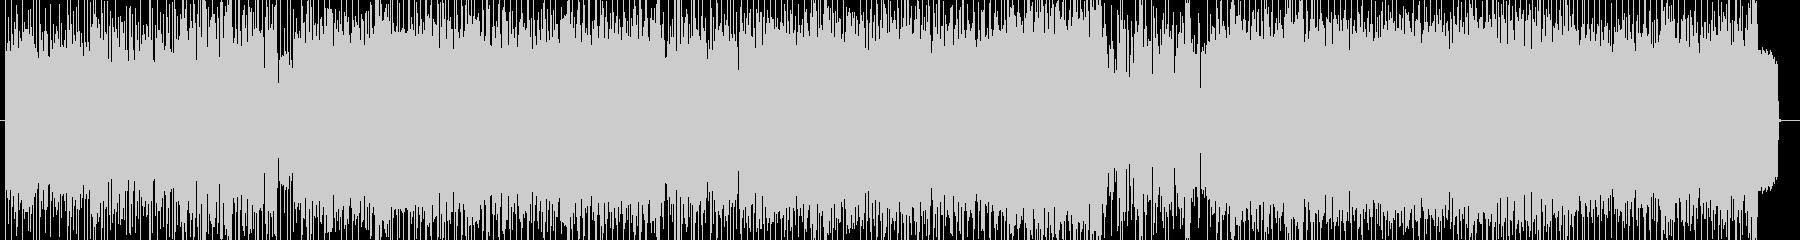 「HR/HM」「DARK」BGM90の未再生の波形